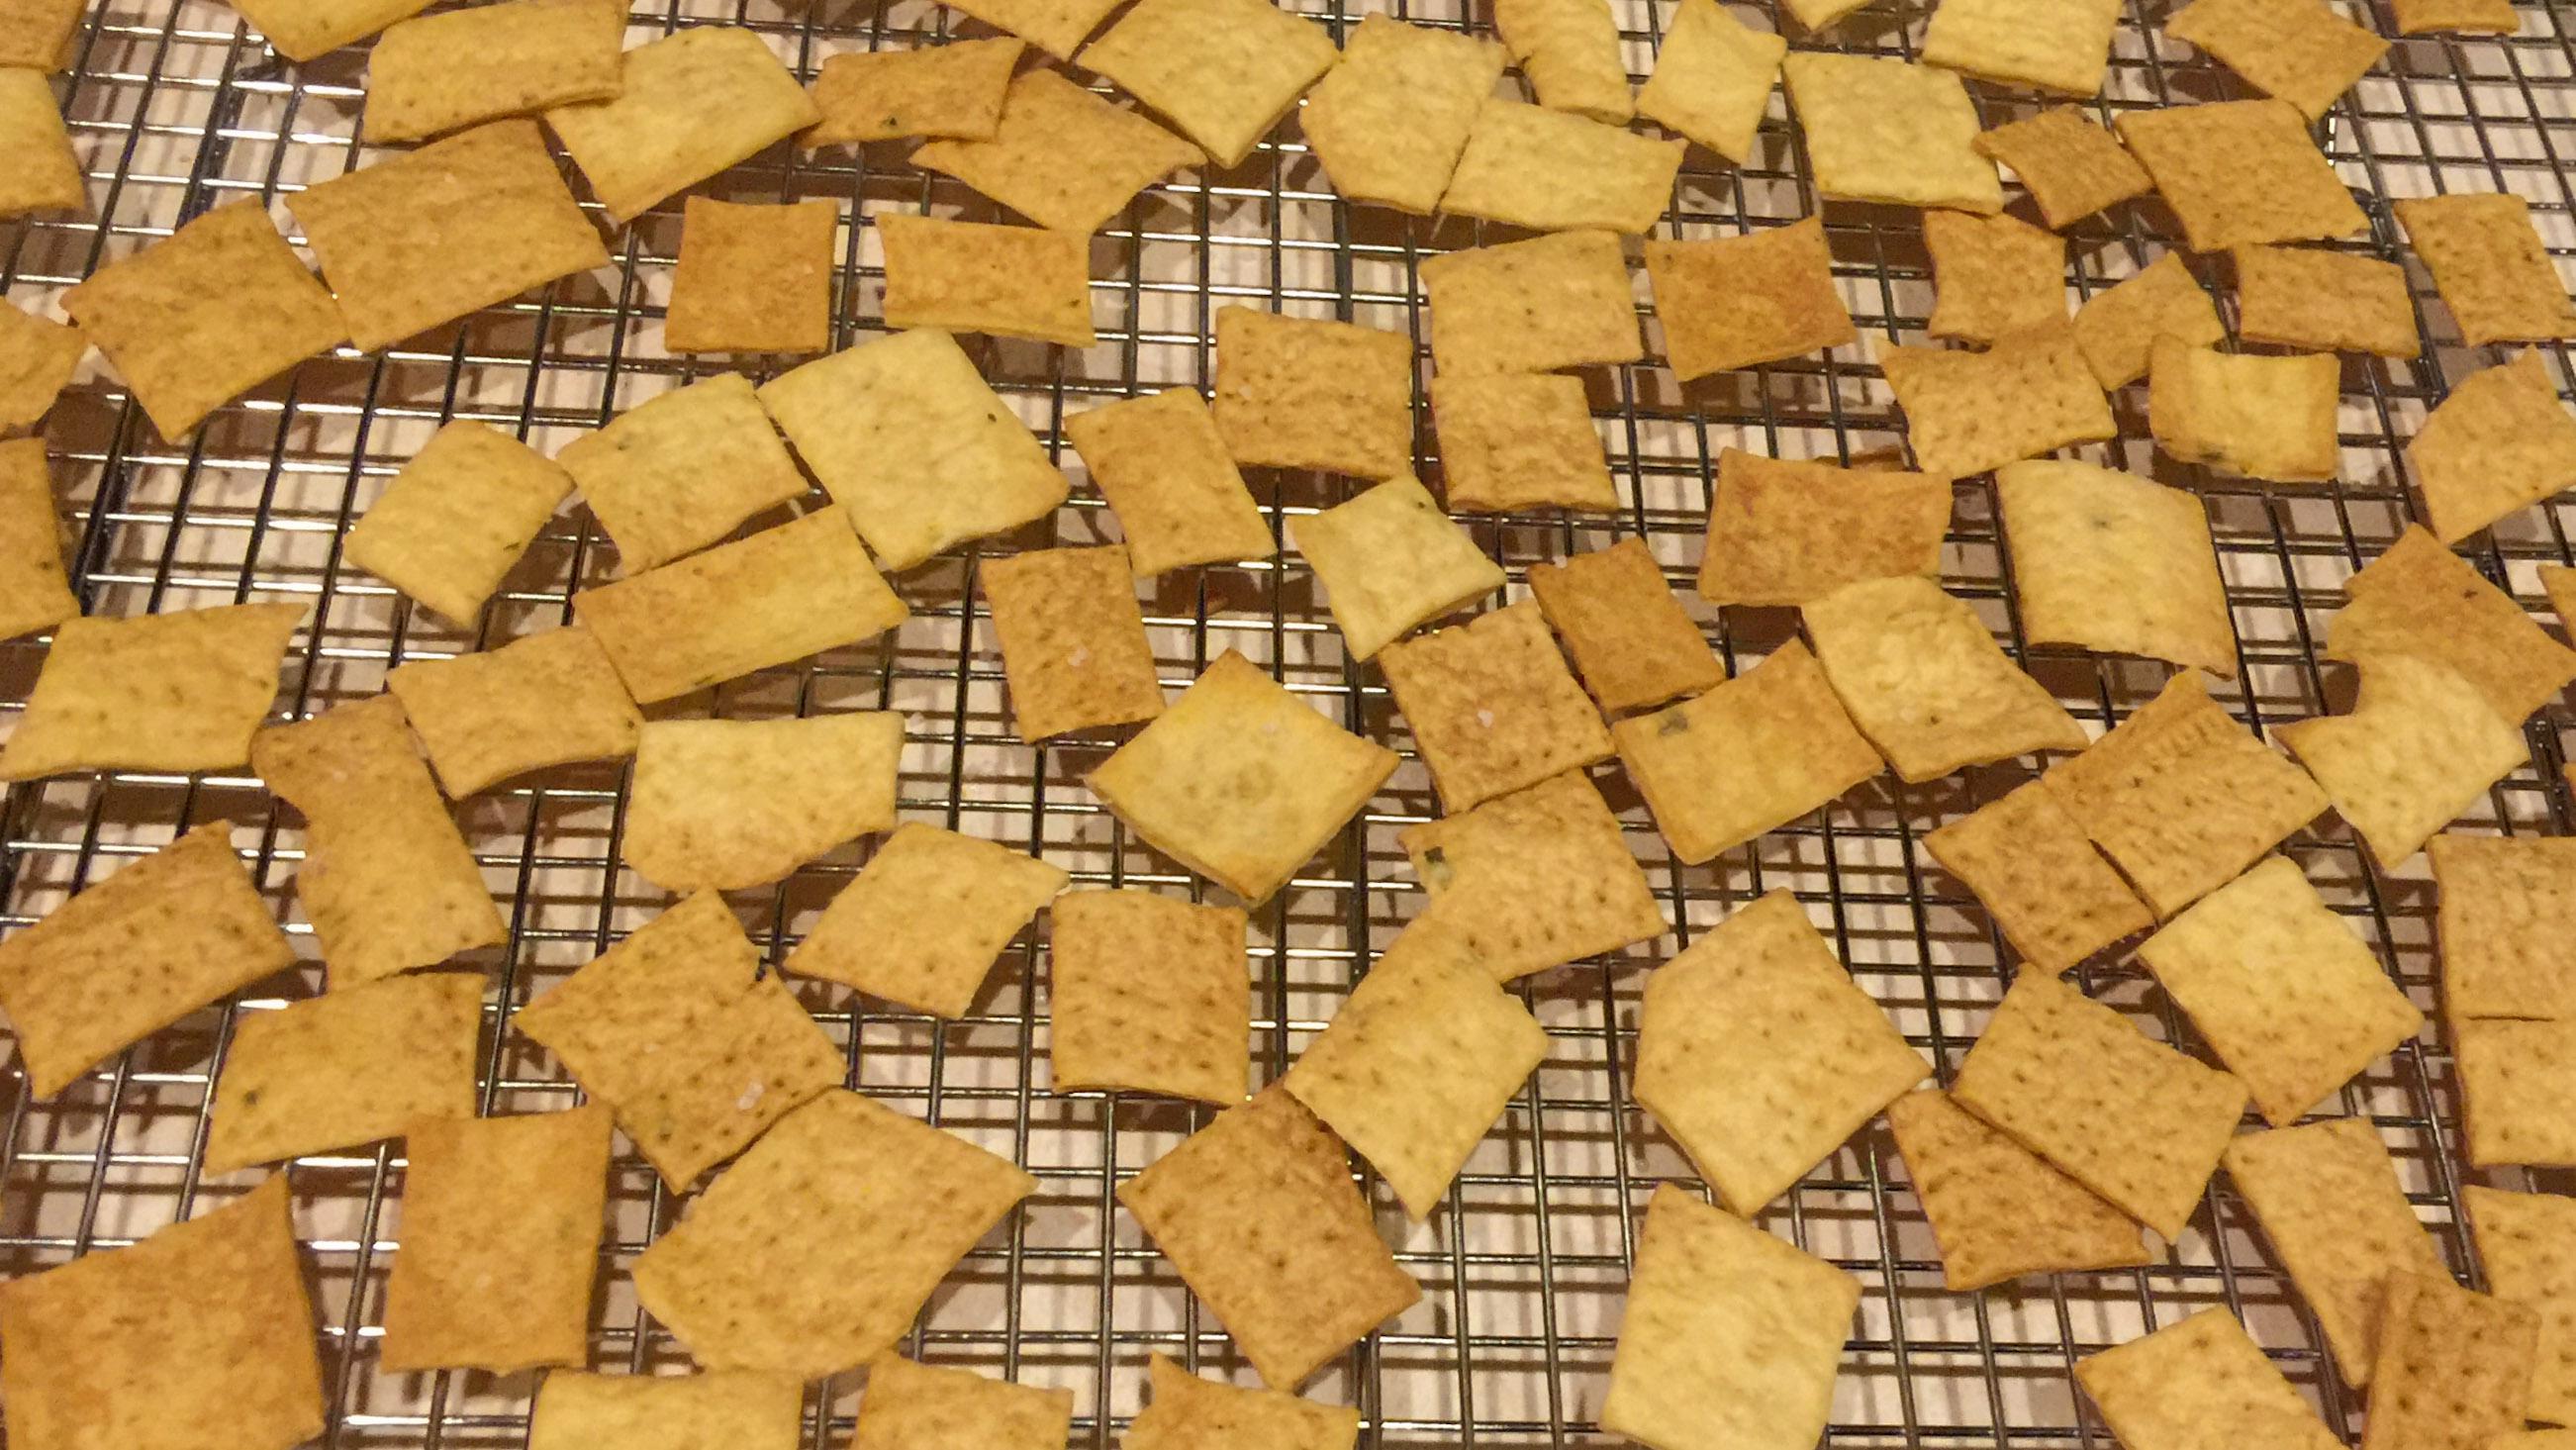 Sourdough crackers cooling